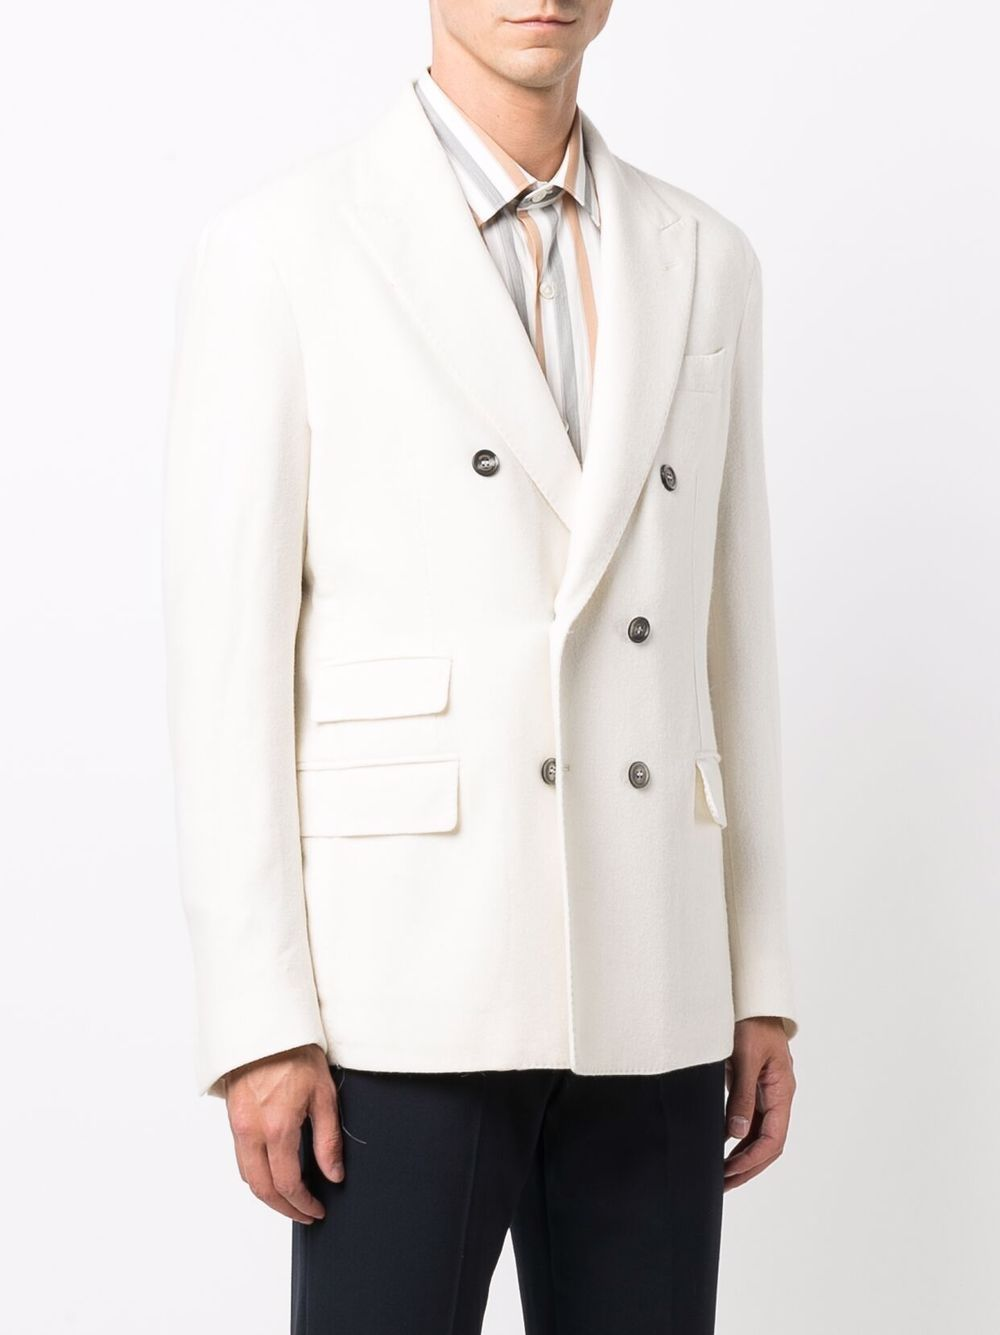 giacca sartoriale doppiopetto in alpaca e cashmere bianca ELEVENTY | Giacche | D75GIAC14-TES0D06801